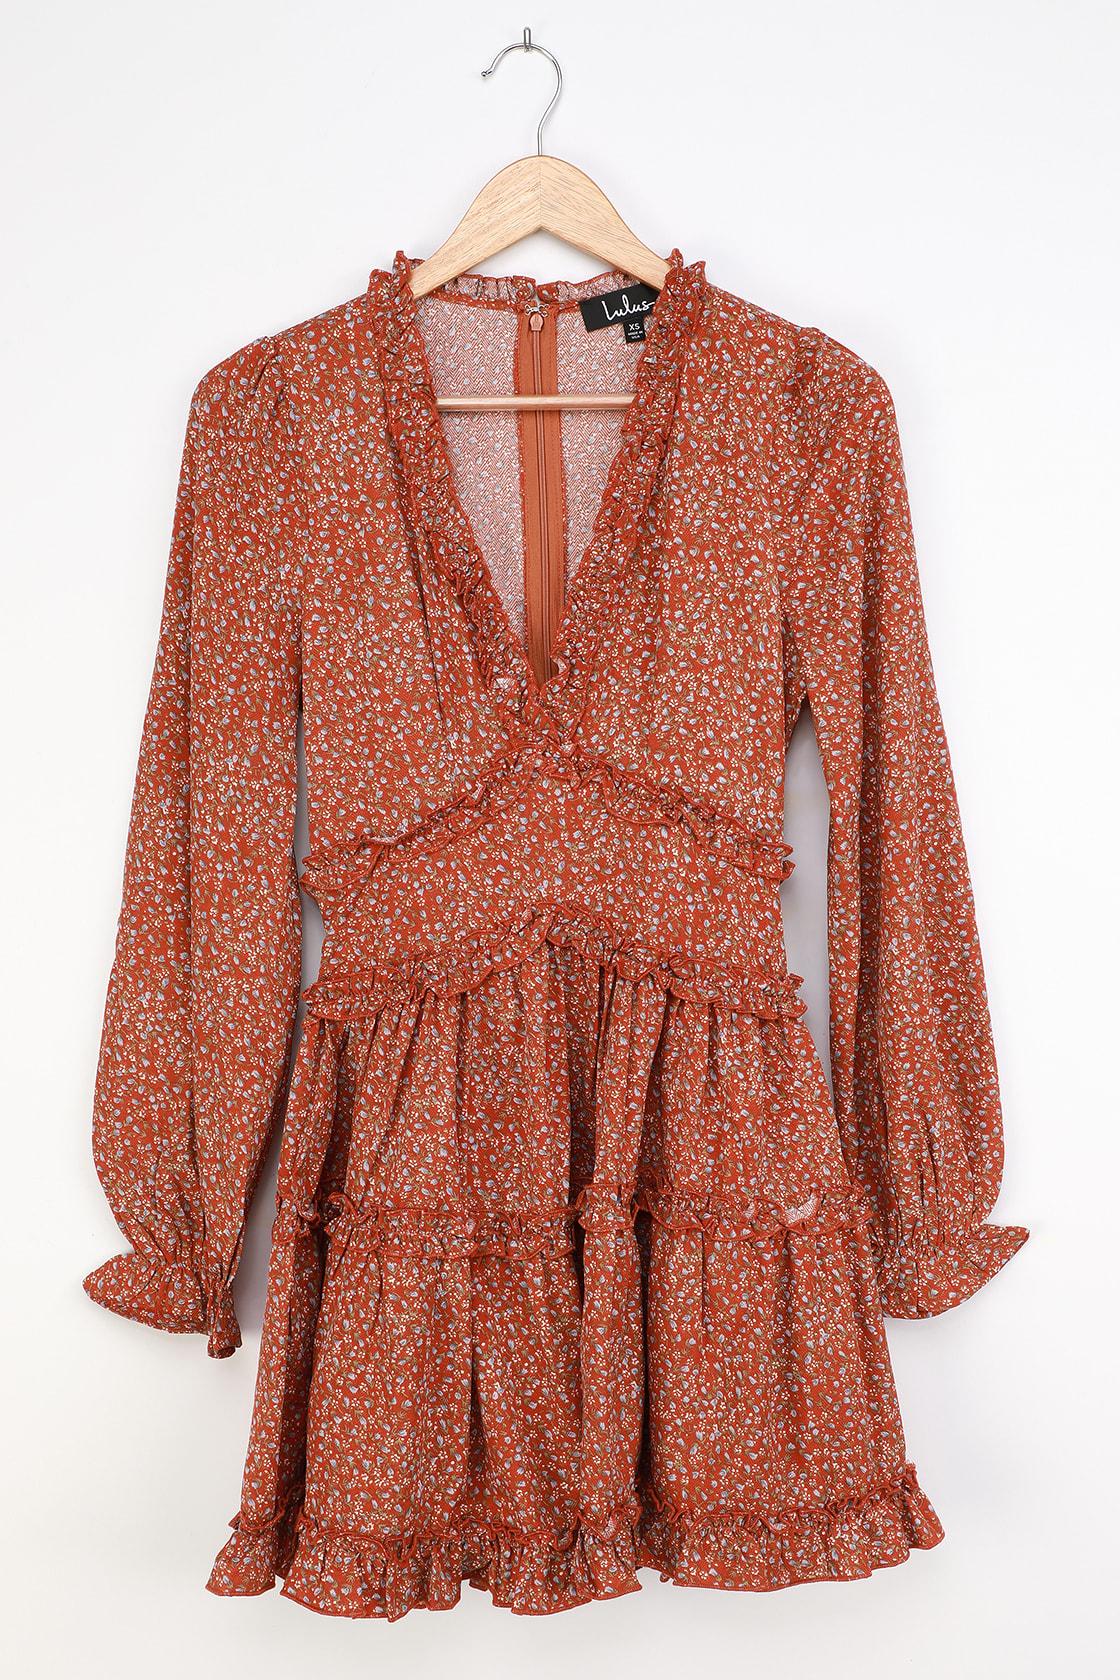 Admire You Orange Floral Print Ruffled Long Sleeve Mini Dress